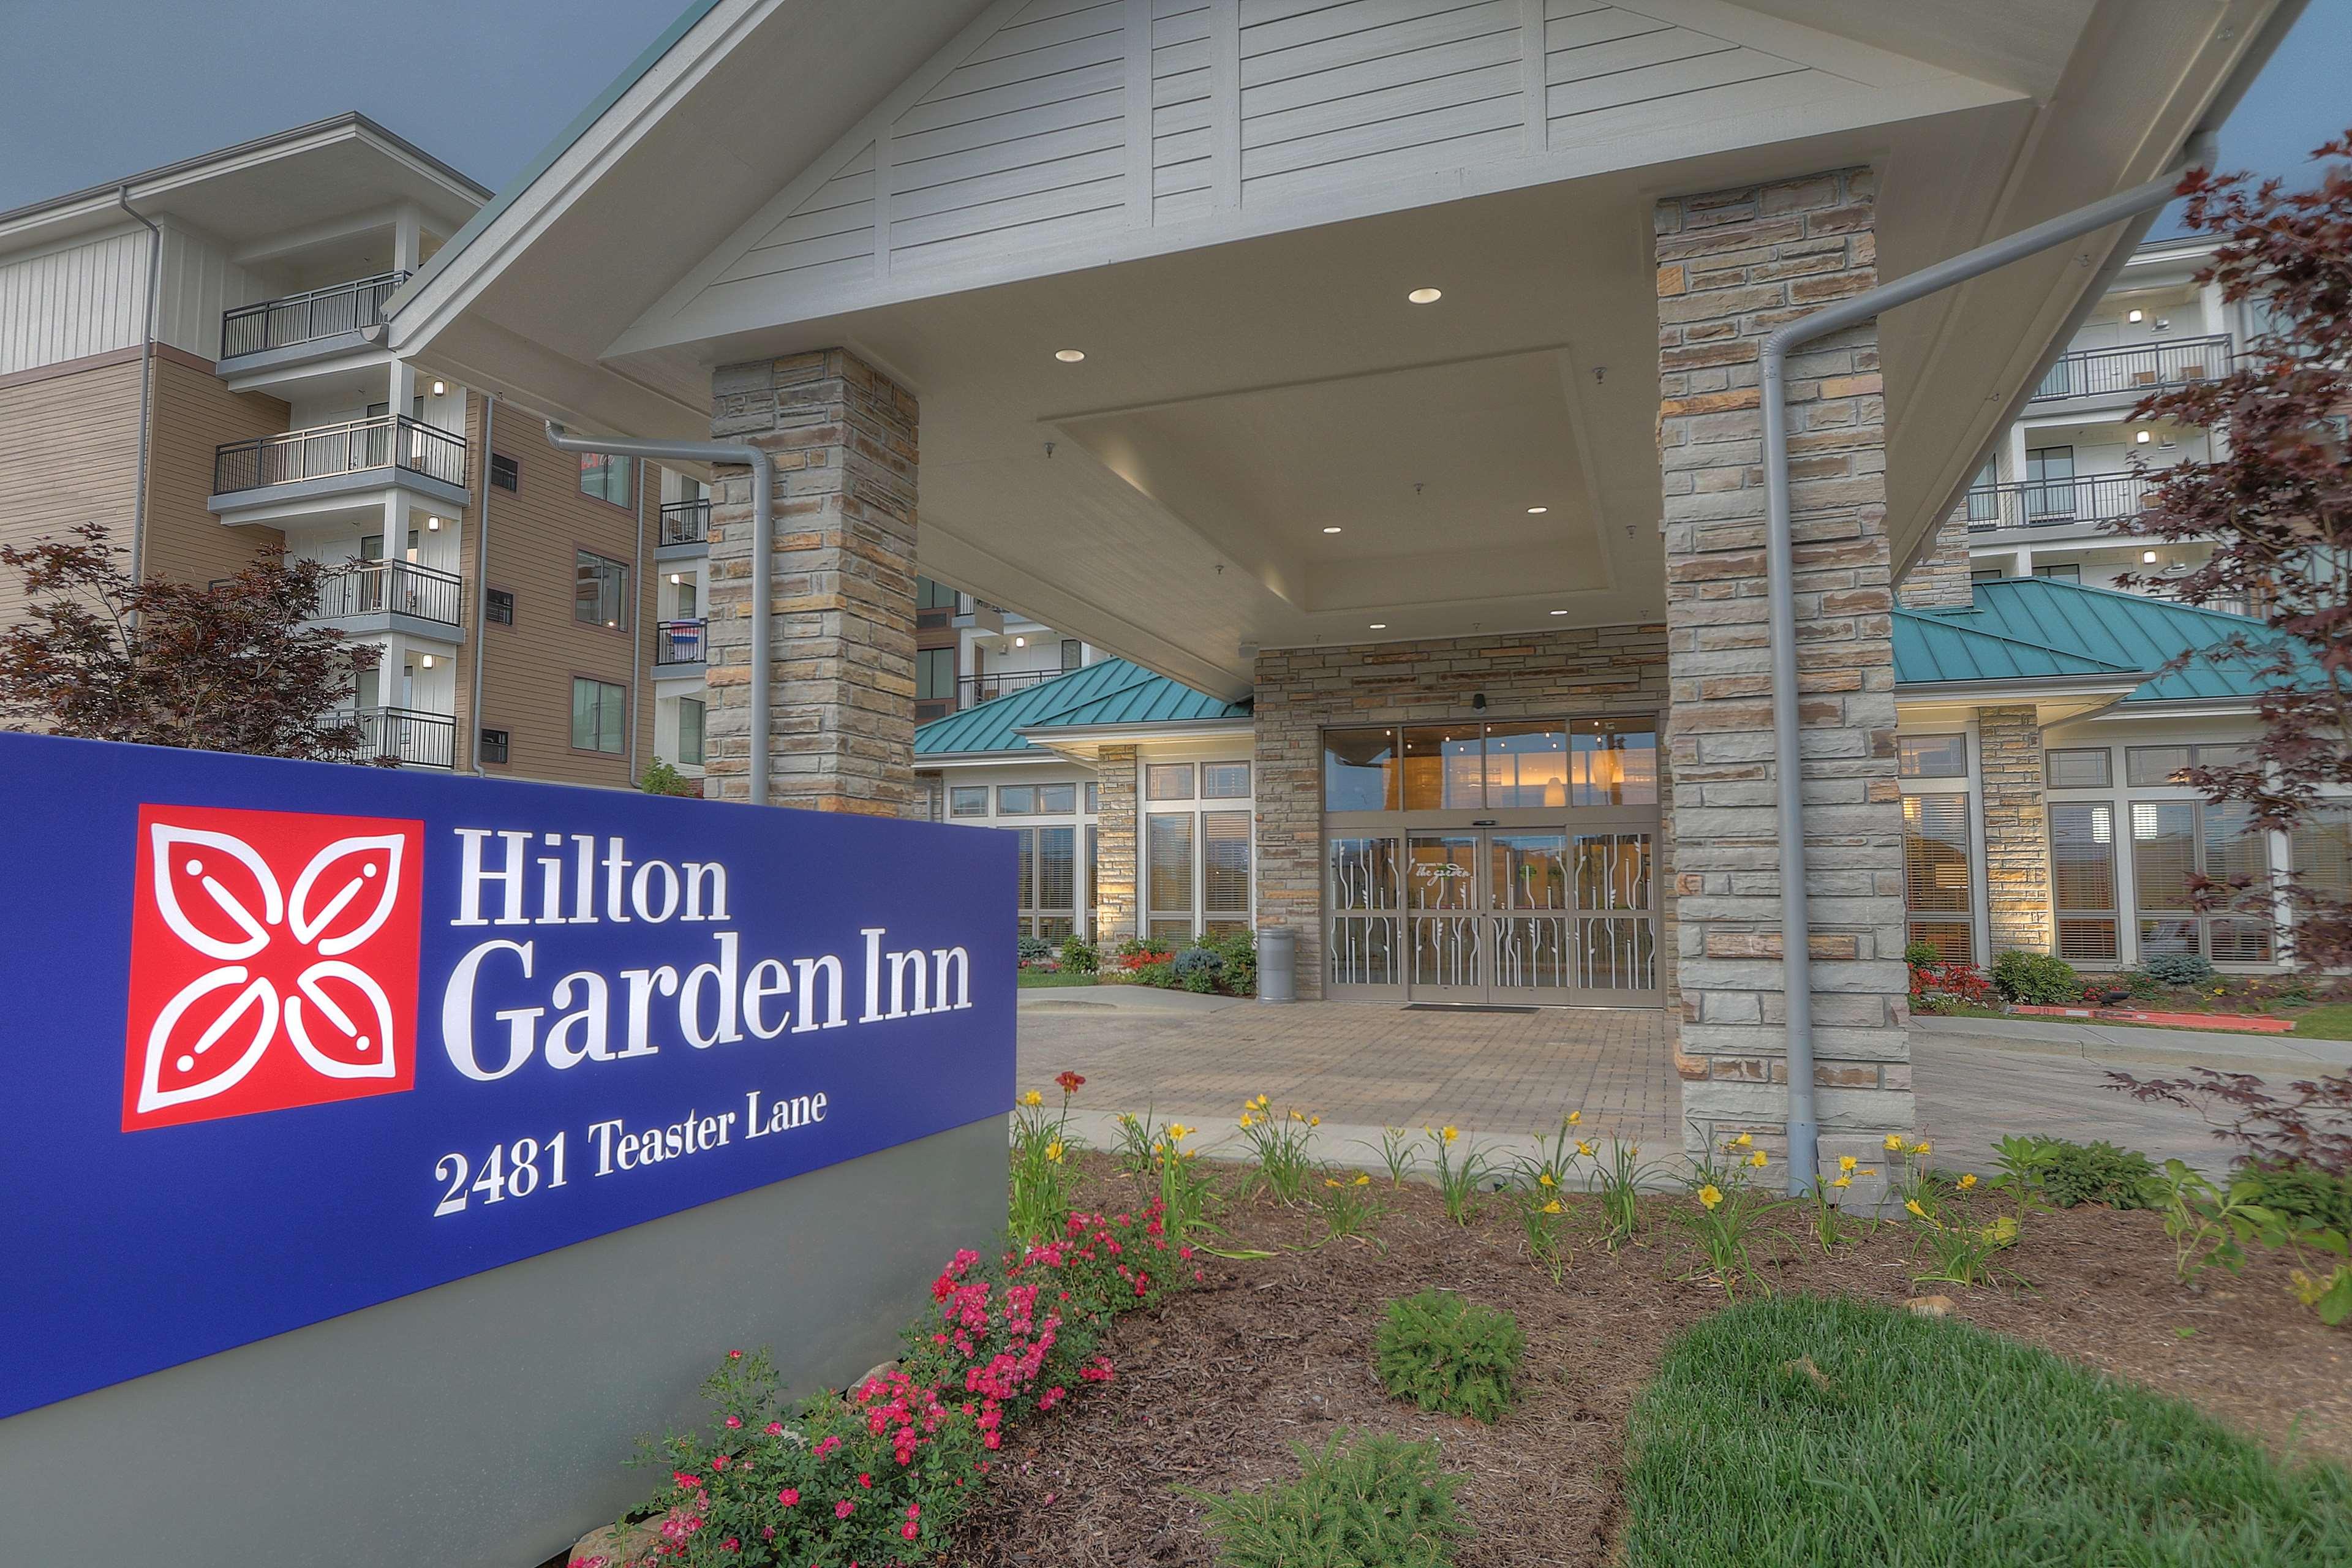 Hilton Garden Inn Pigeon Forge Pigeon Forge Tennessee Tn